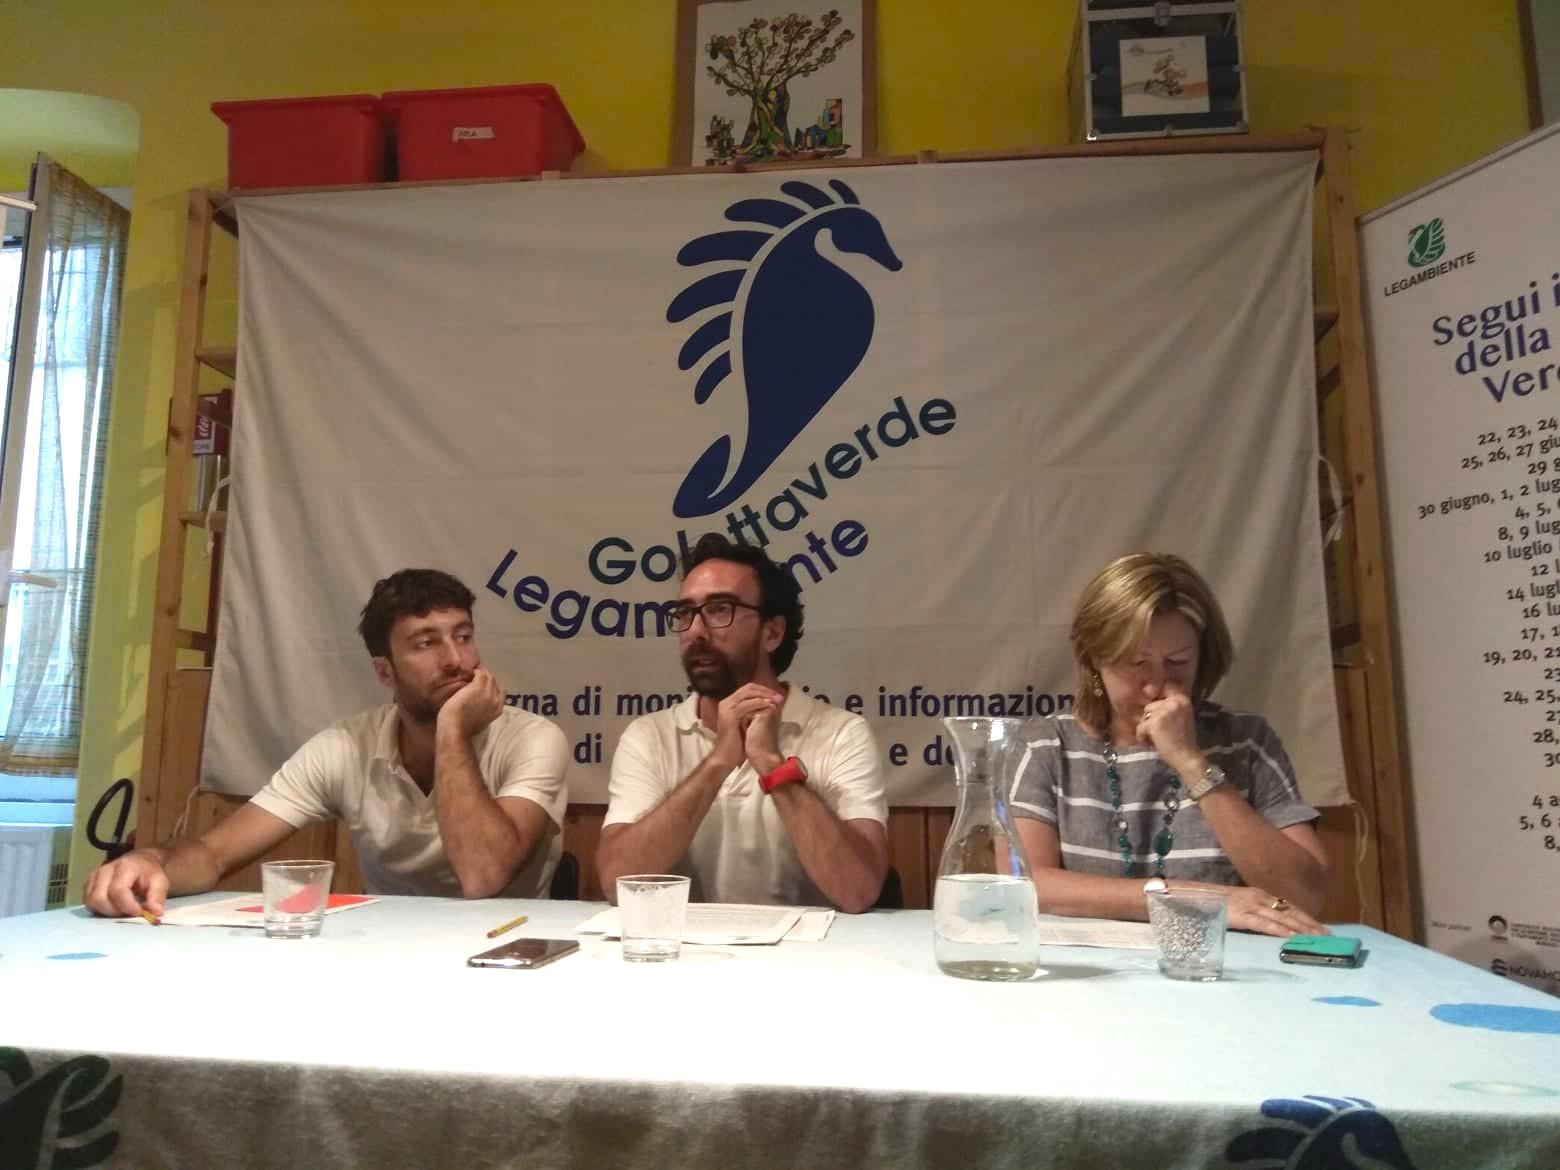 Liguria Conferenza stampa